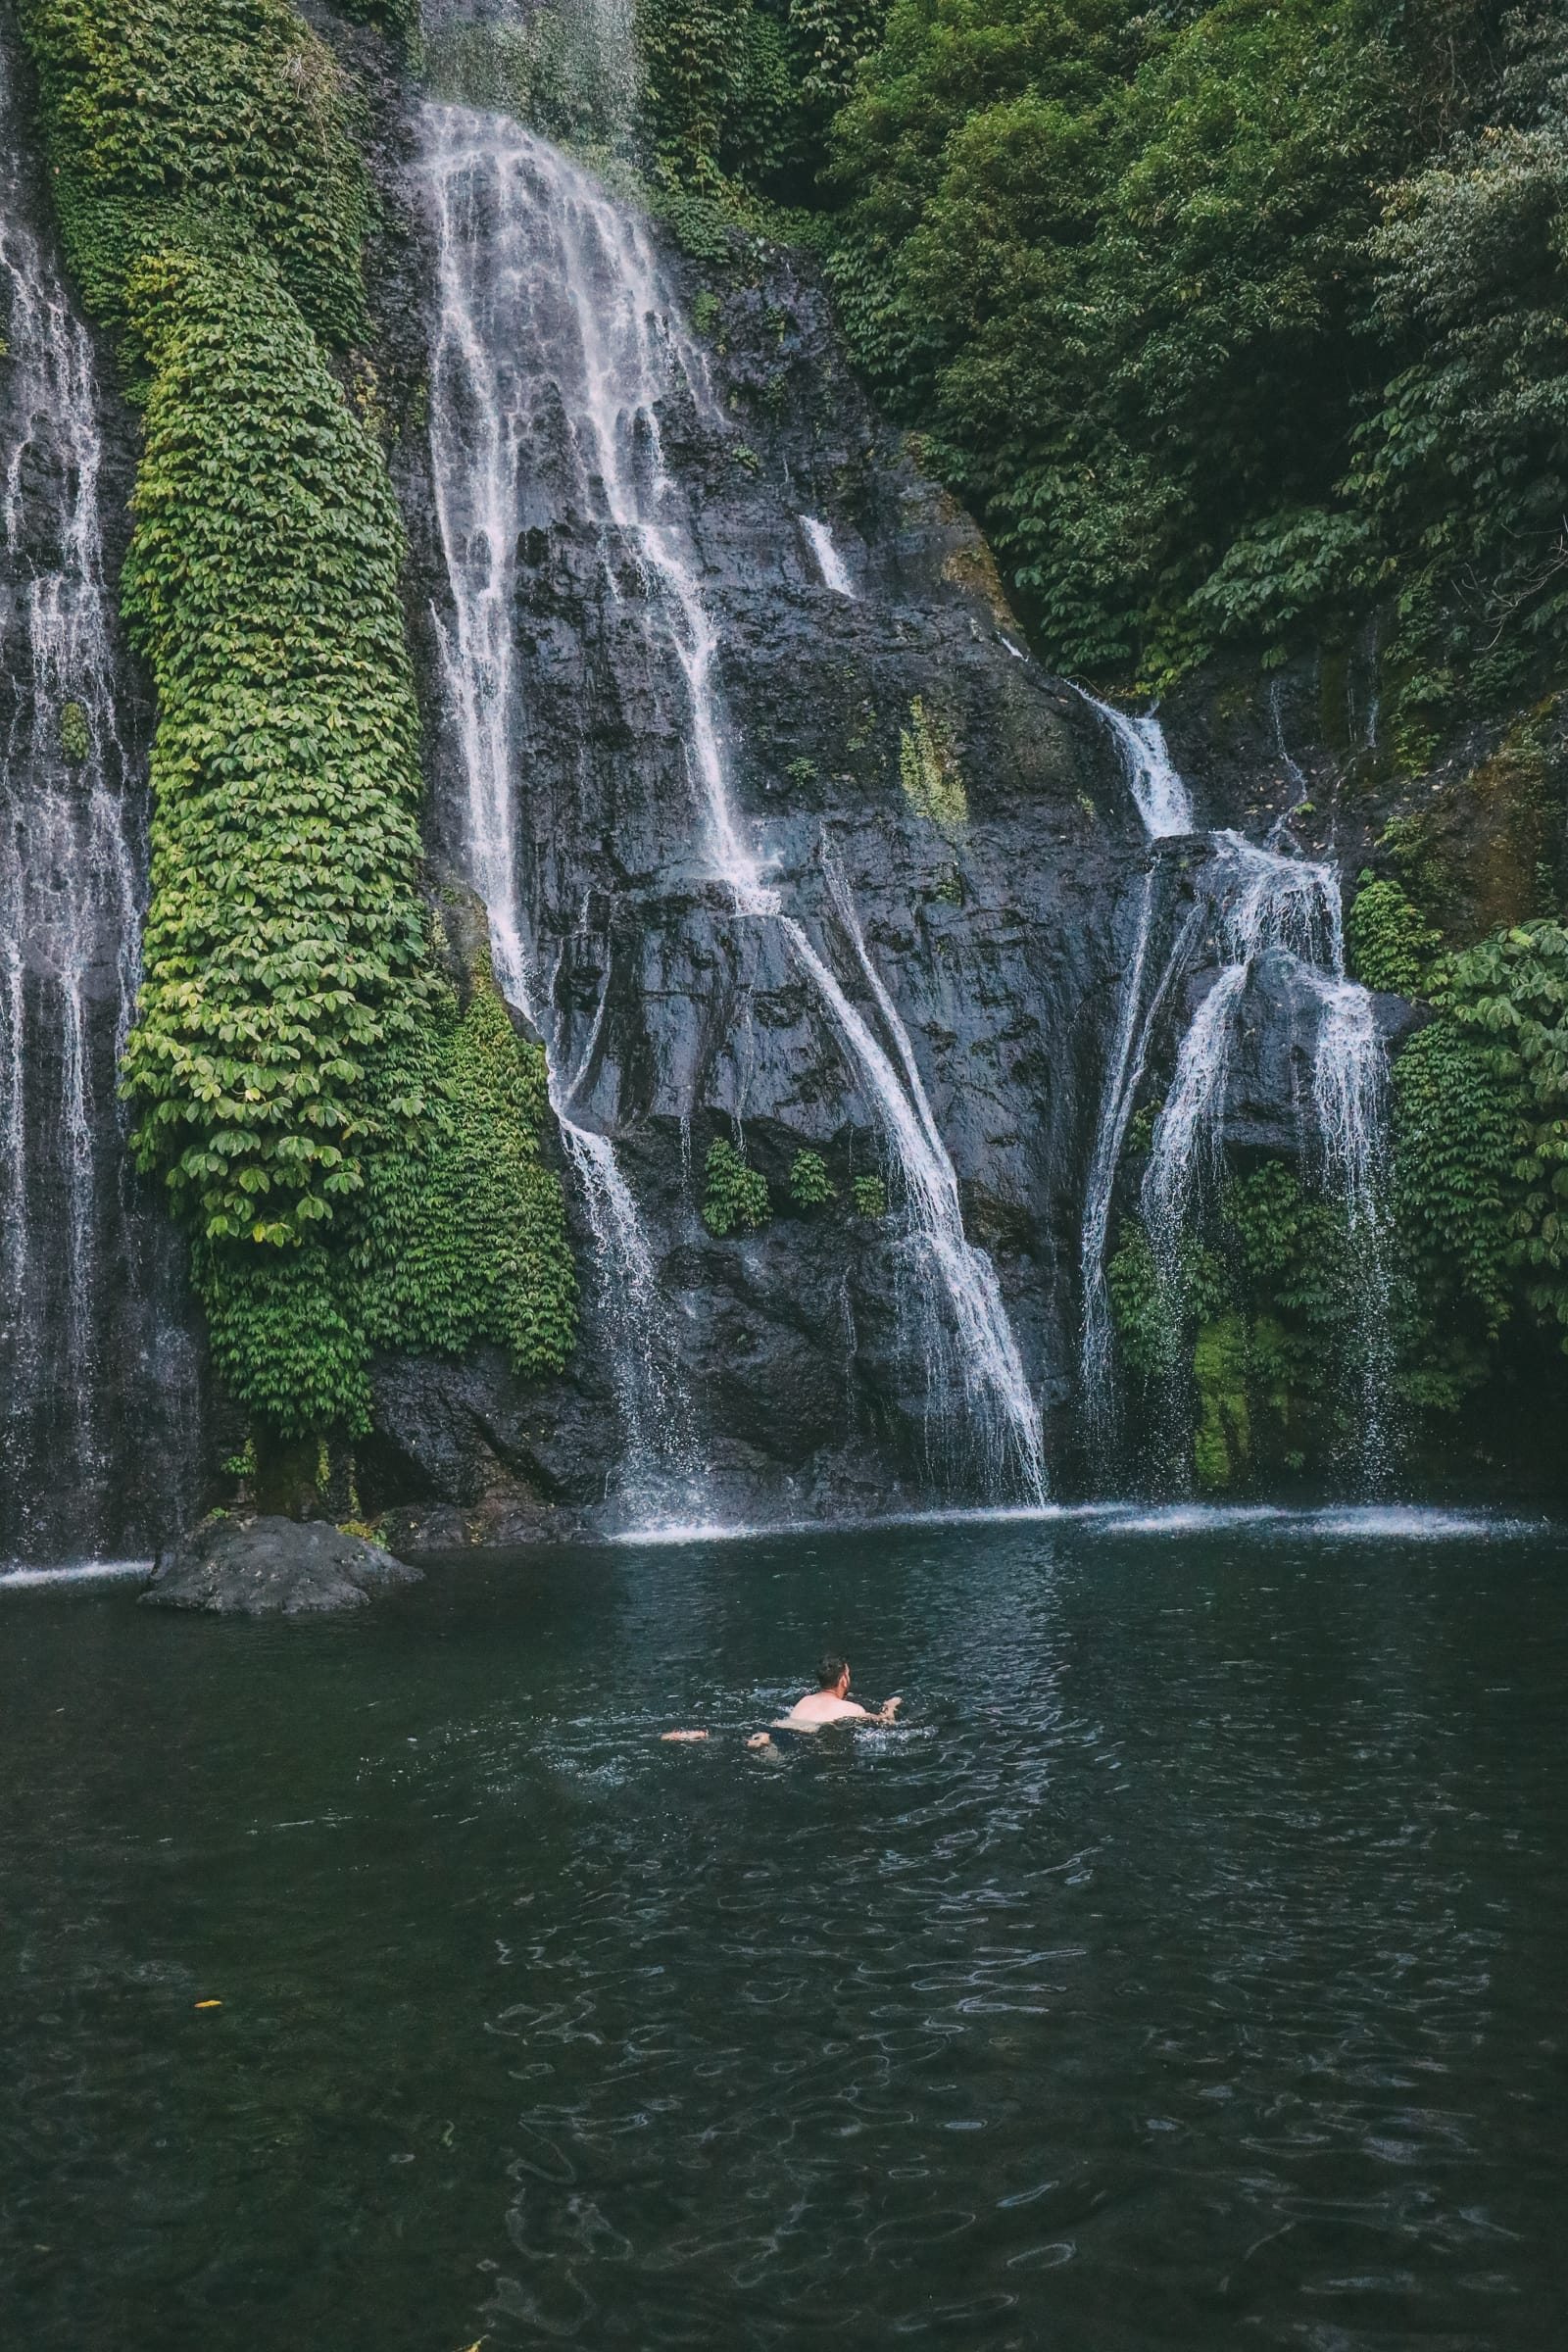 The Amazing Banyumala Twin Waterfalls In The Jungles Of Bali (13)